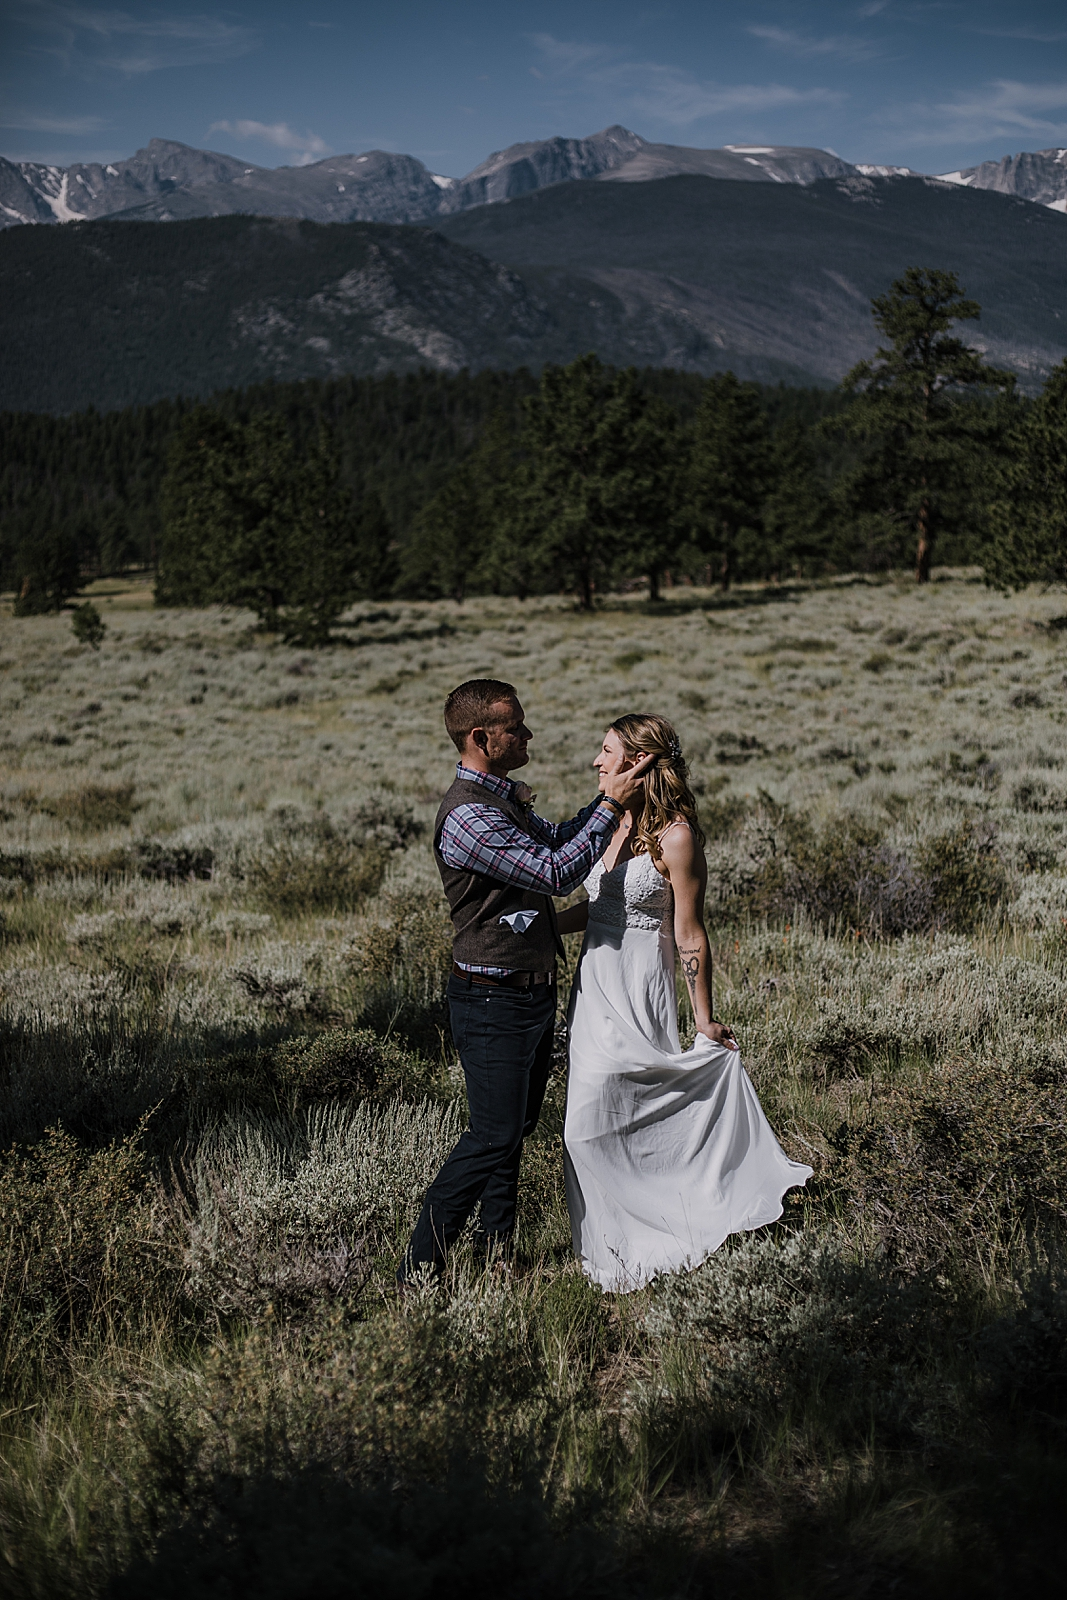 bride and groom dancing, RMNP elopement ceremony, rocky mountain national park elopement, 3M curves elopement, self solemnizing, self solemnization, long's peak, summer elopement, estes park elopement